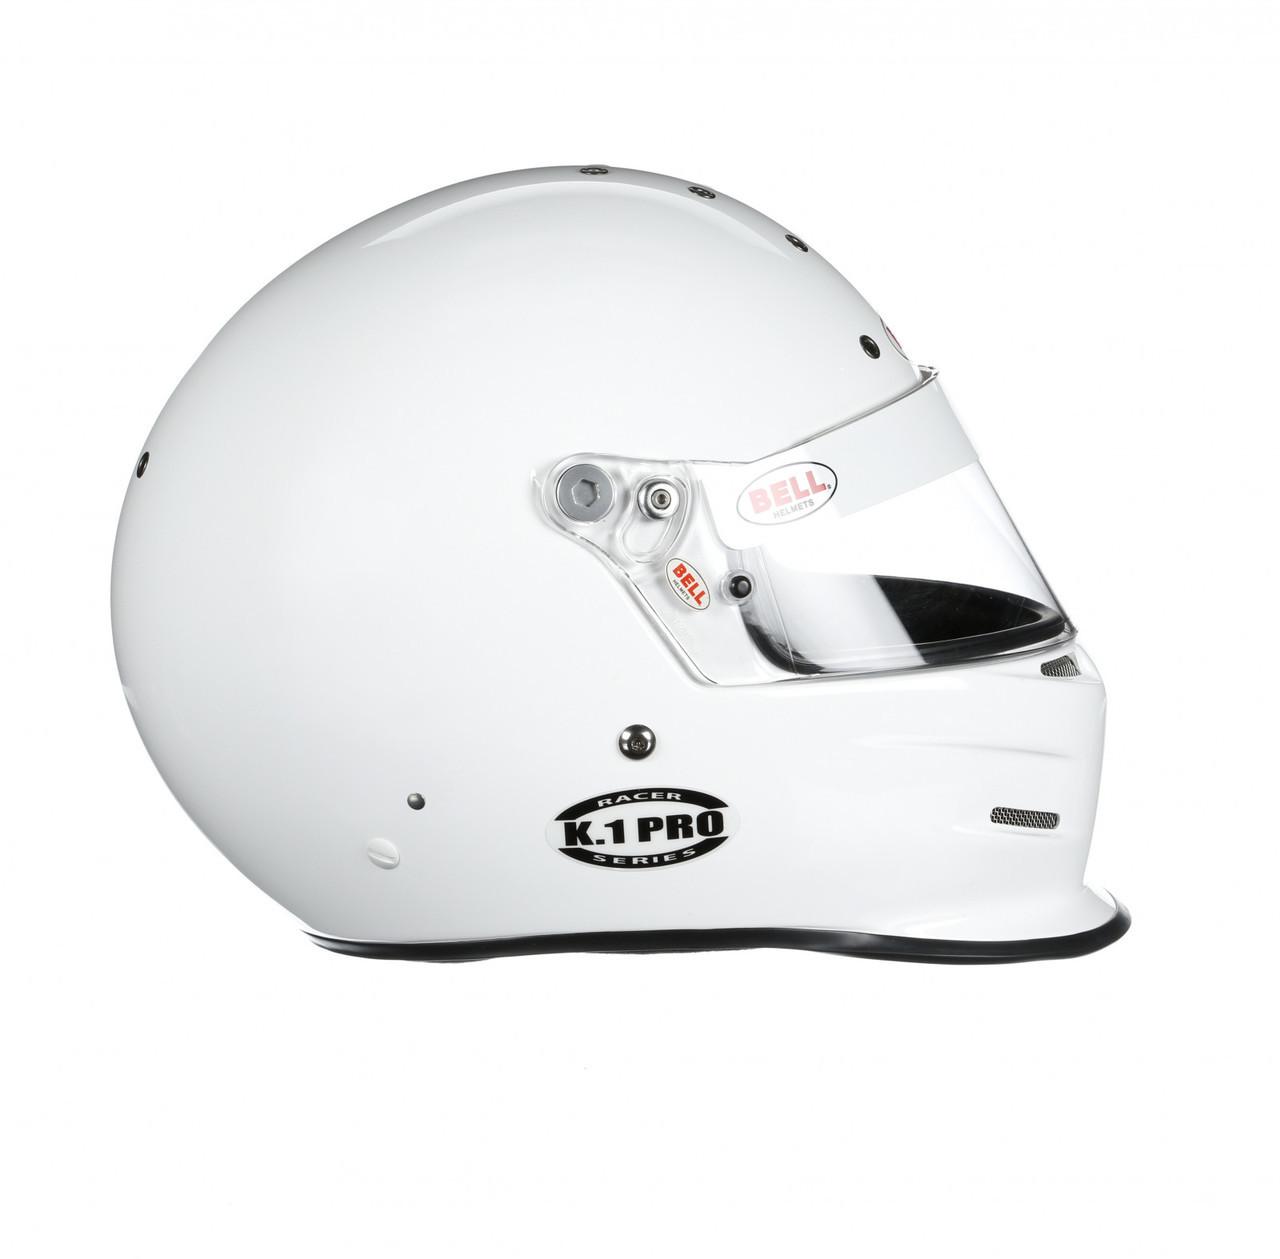 Bell Racing Helmets >> Bell K1 Pro Racing Helmet White Extra Large